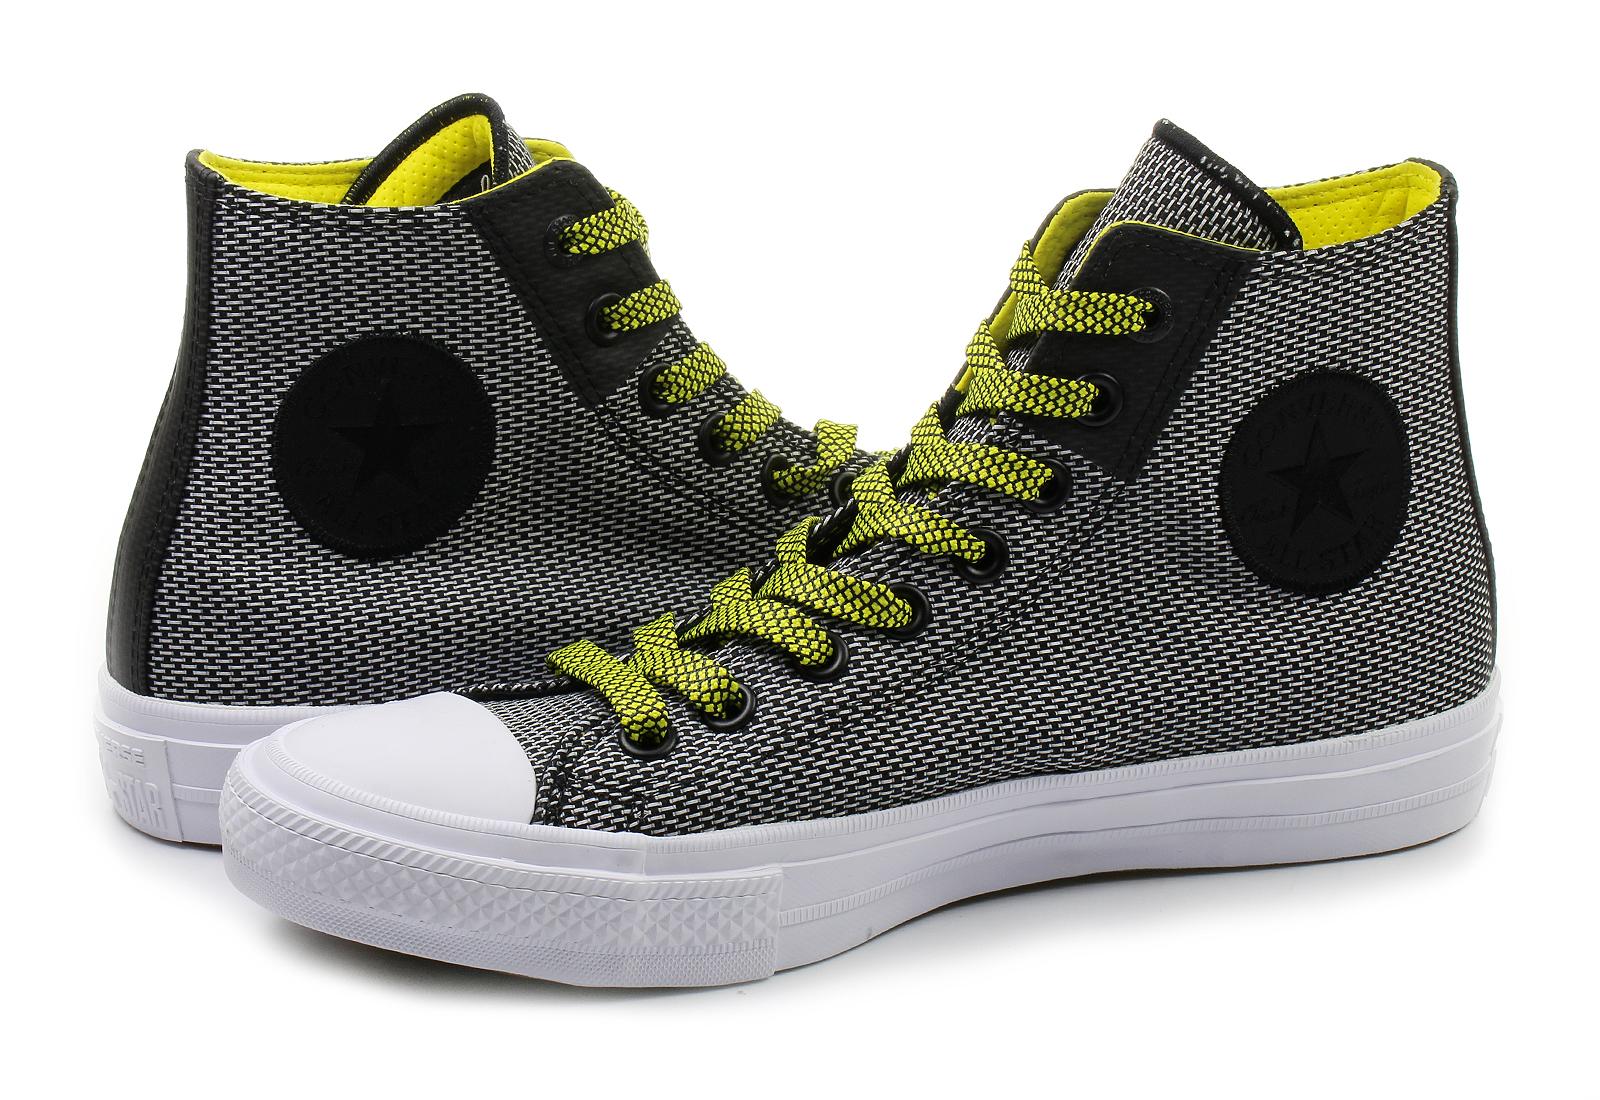 Converse Visoke Cipele Crne Tenisice - Chuck Taylor All Star II Specialty Hi  - Office Shoes - Online trgovina obuće a77ba9acaf6